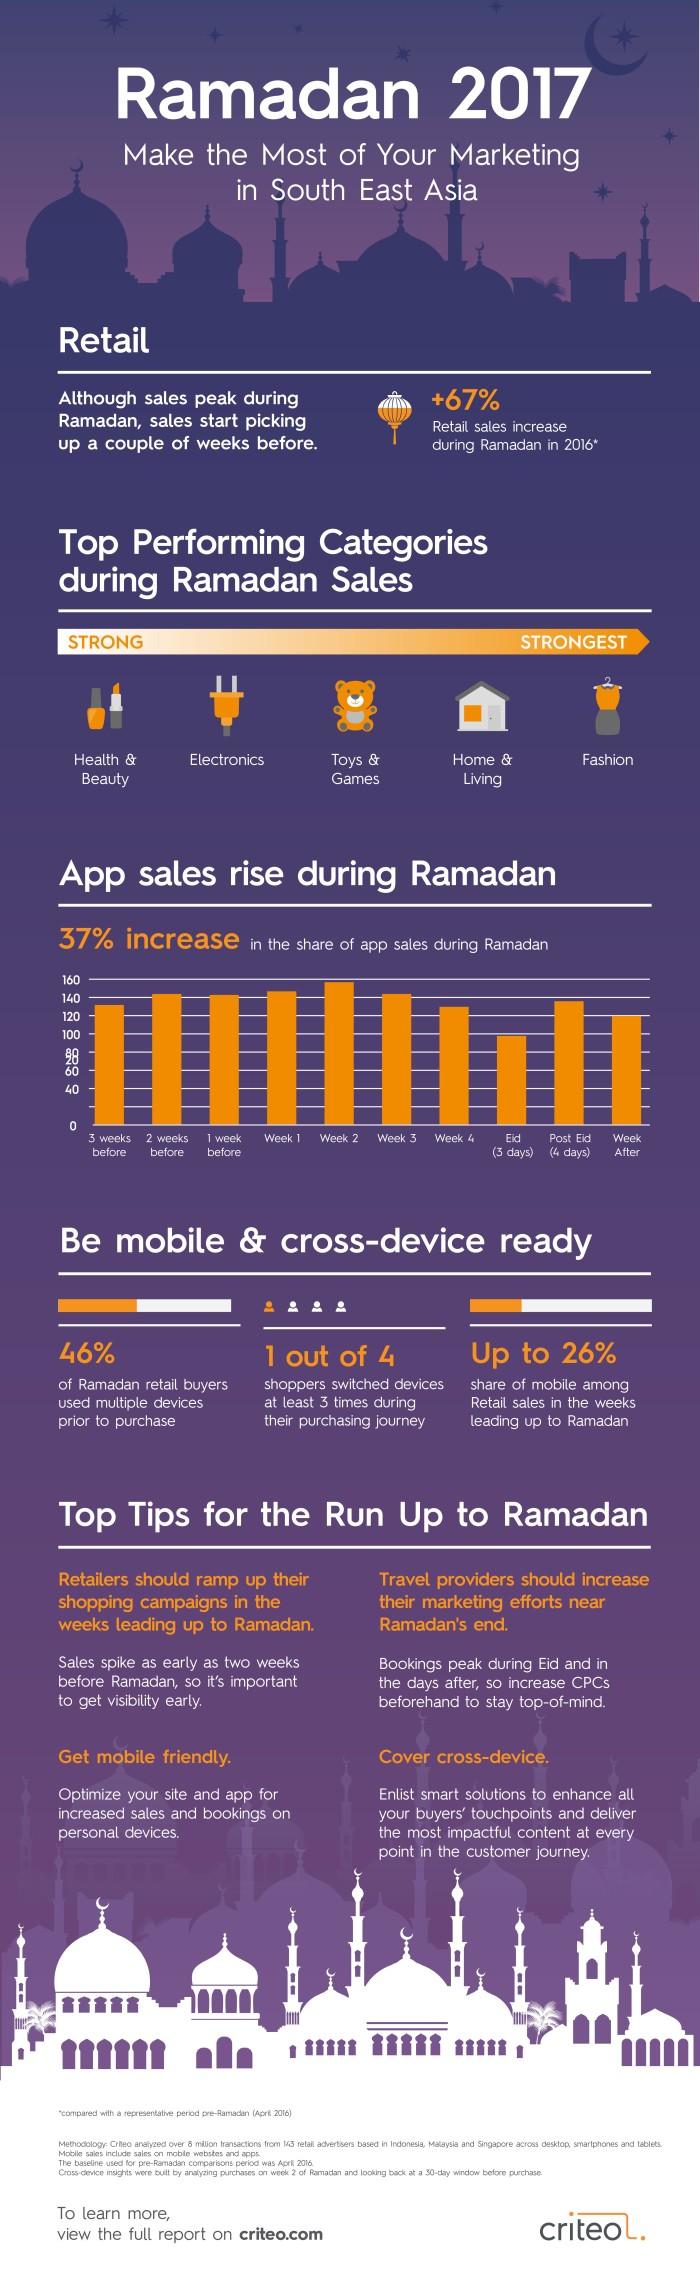 Criteo Ramadan report